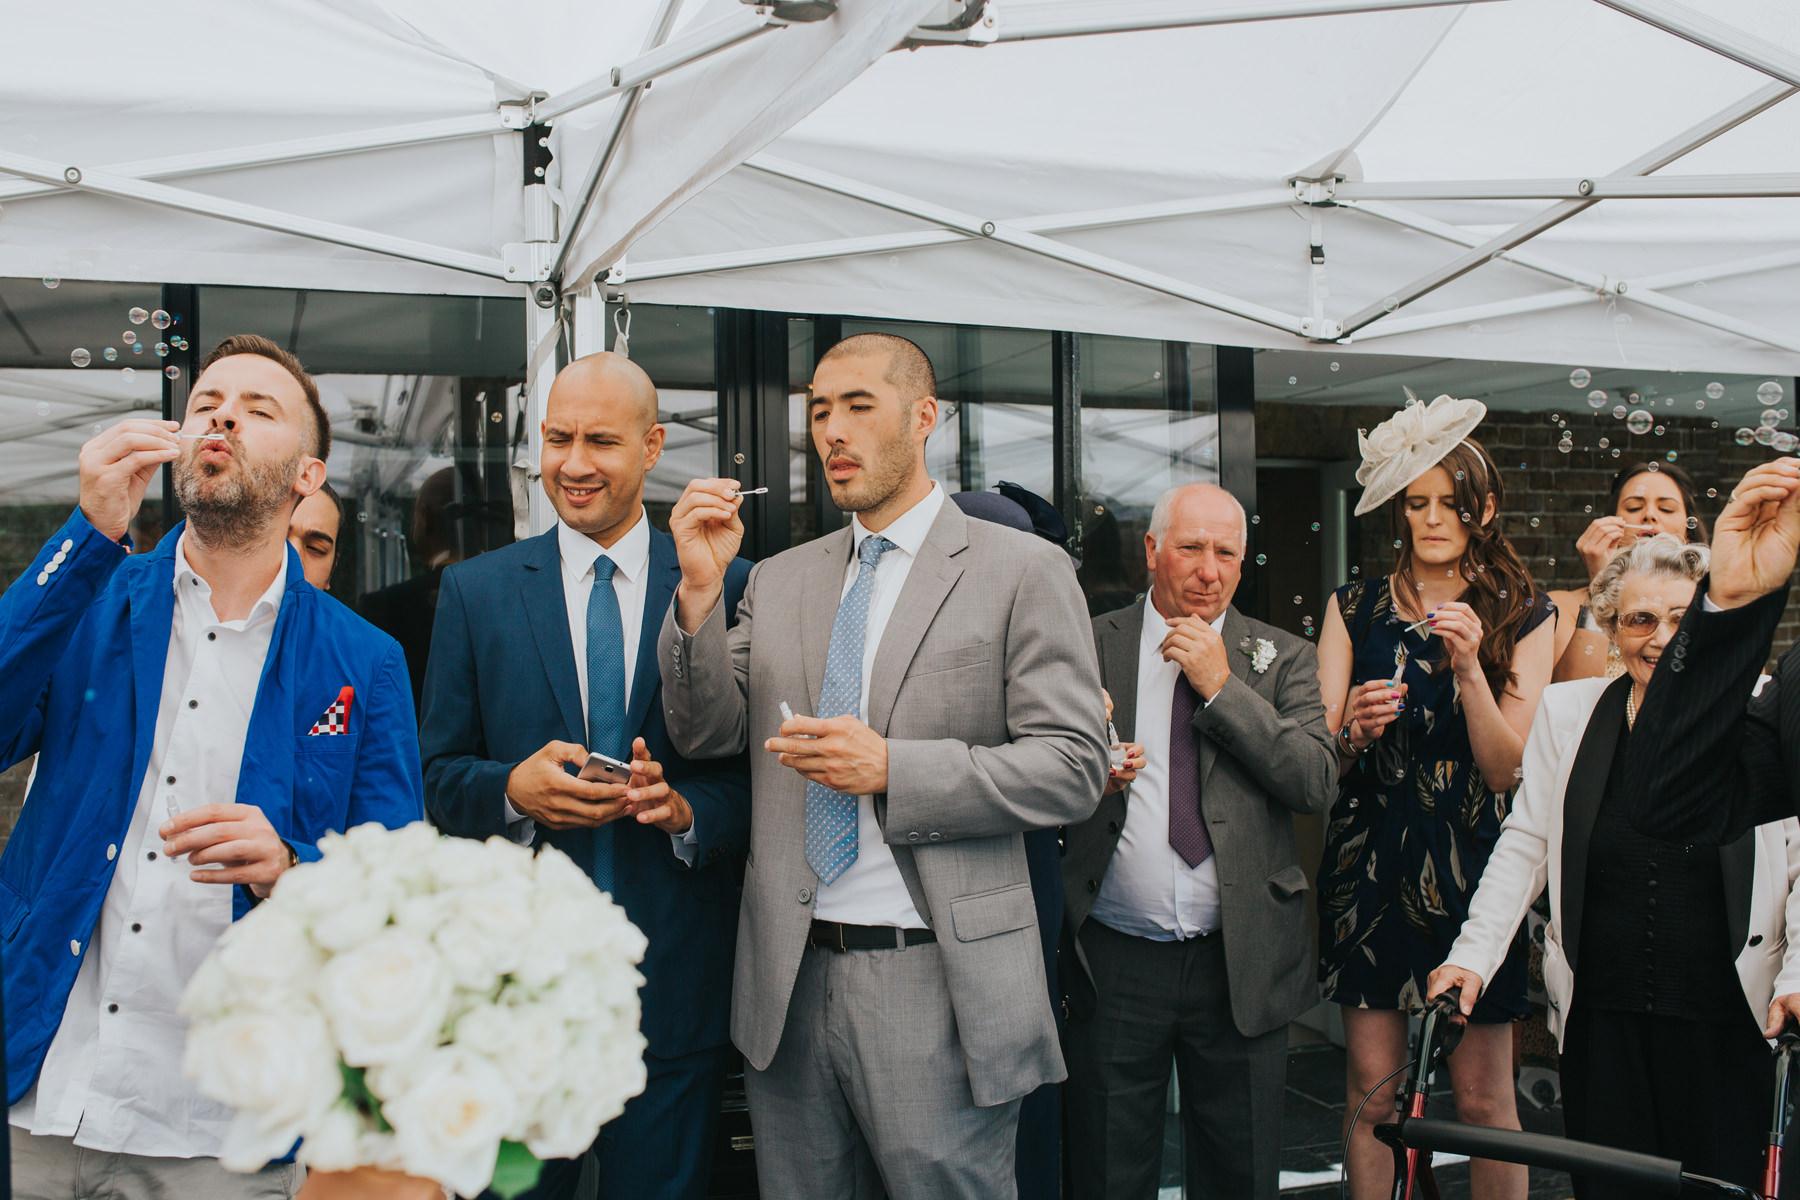 CRL-228-The Bingham Wedding Richmond-groom bride guests blowing bubbles.jpg